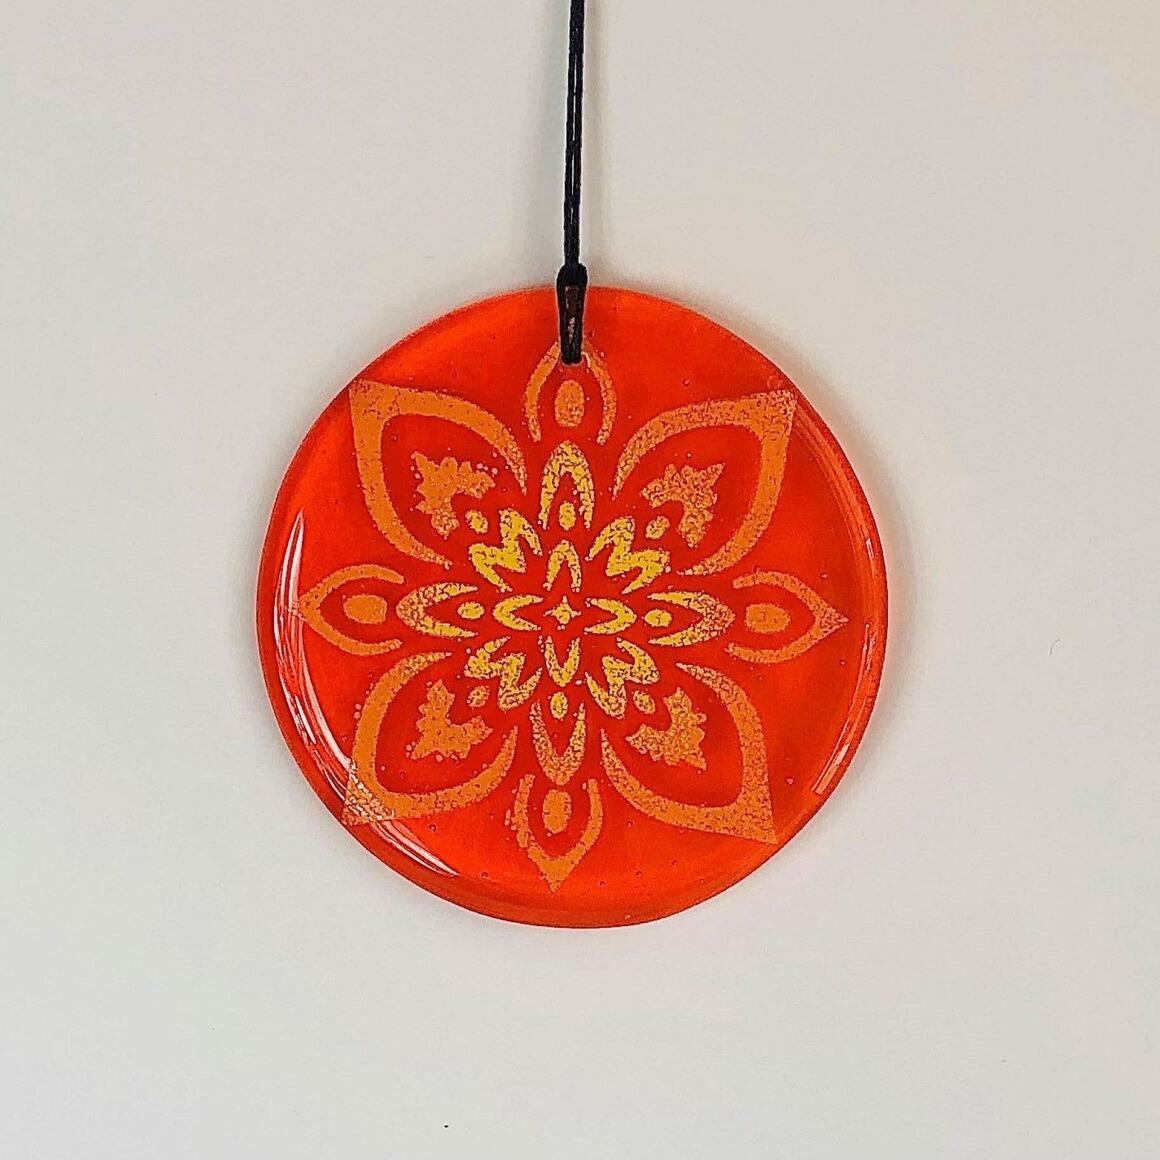 Glass Mandala Window Ornament Suncatcher  - Bright Orange | Trada Marketplace